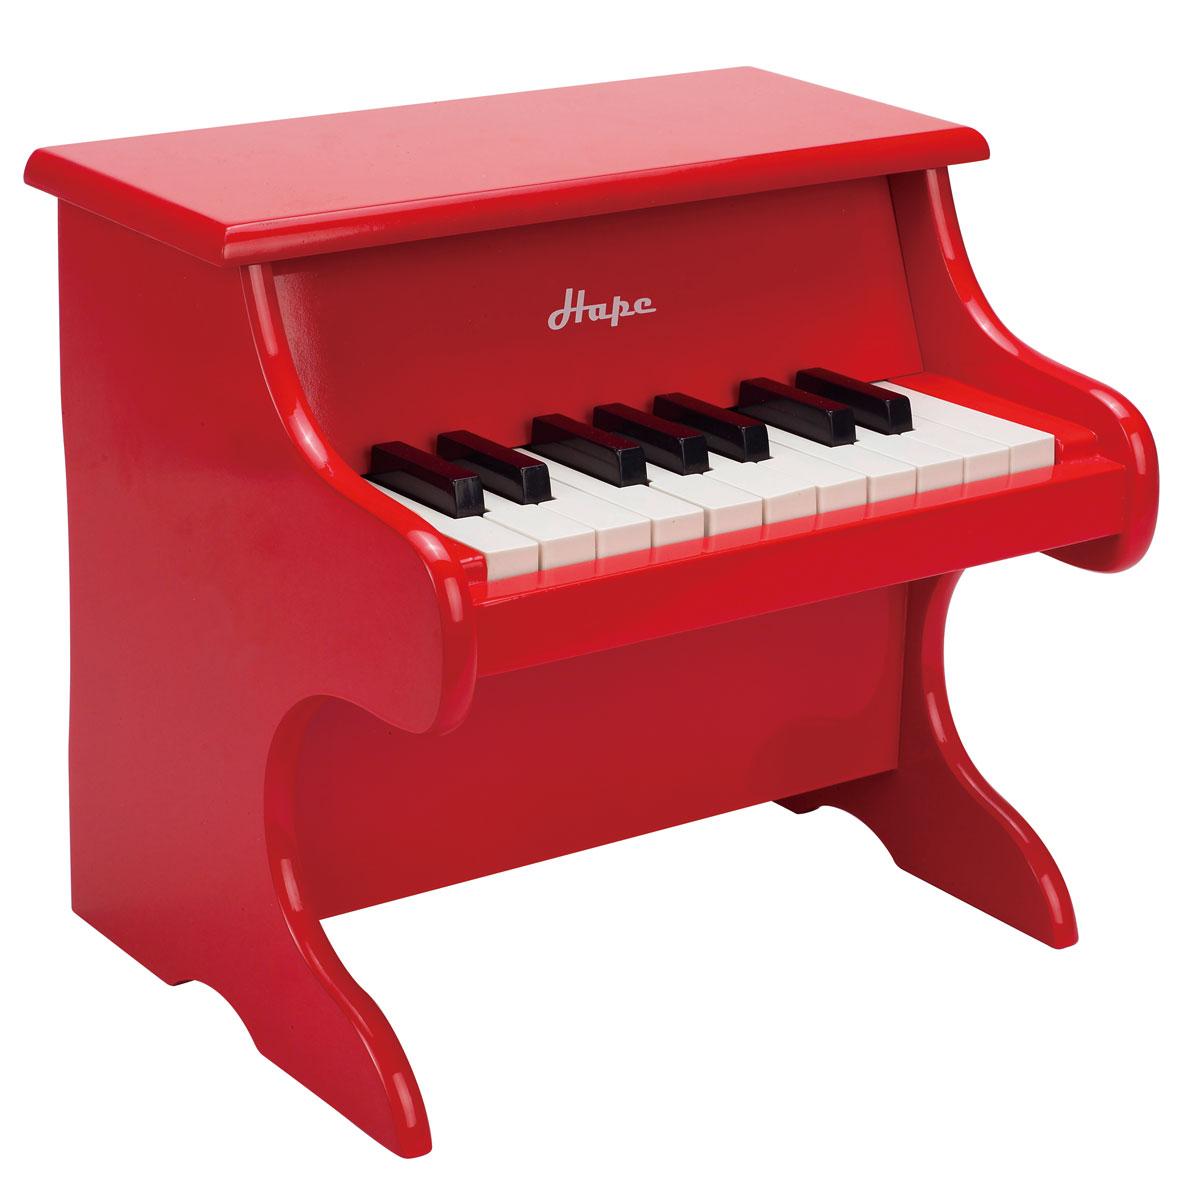 Hape Spielzeug-Klavier E0318 - Kinderklavier   Pirum-Holzspielzeuge.de